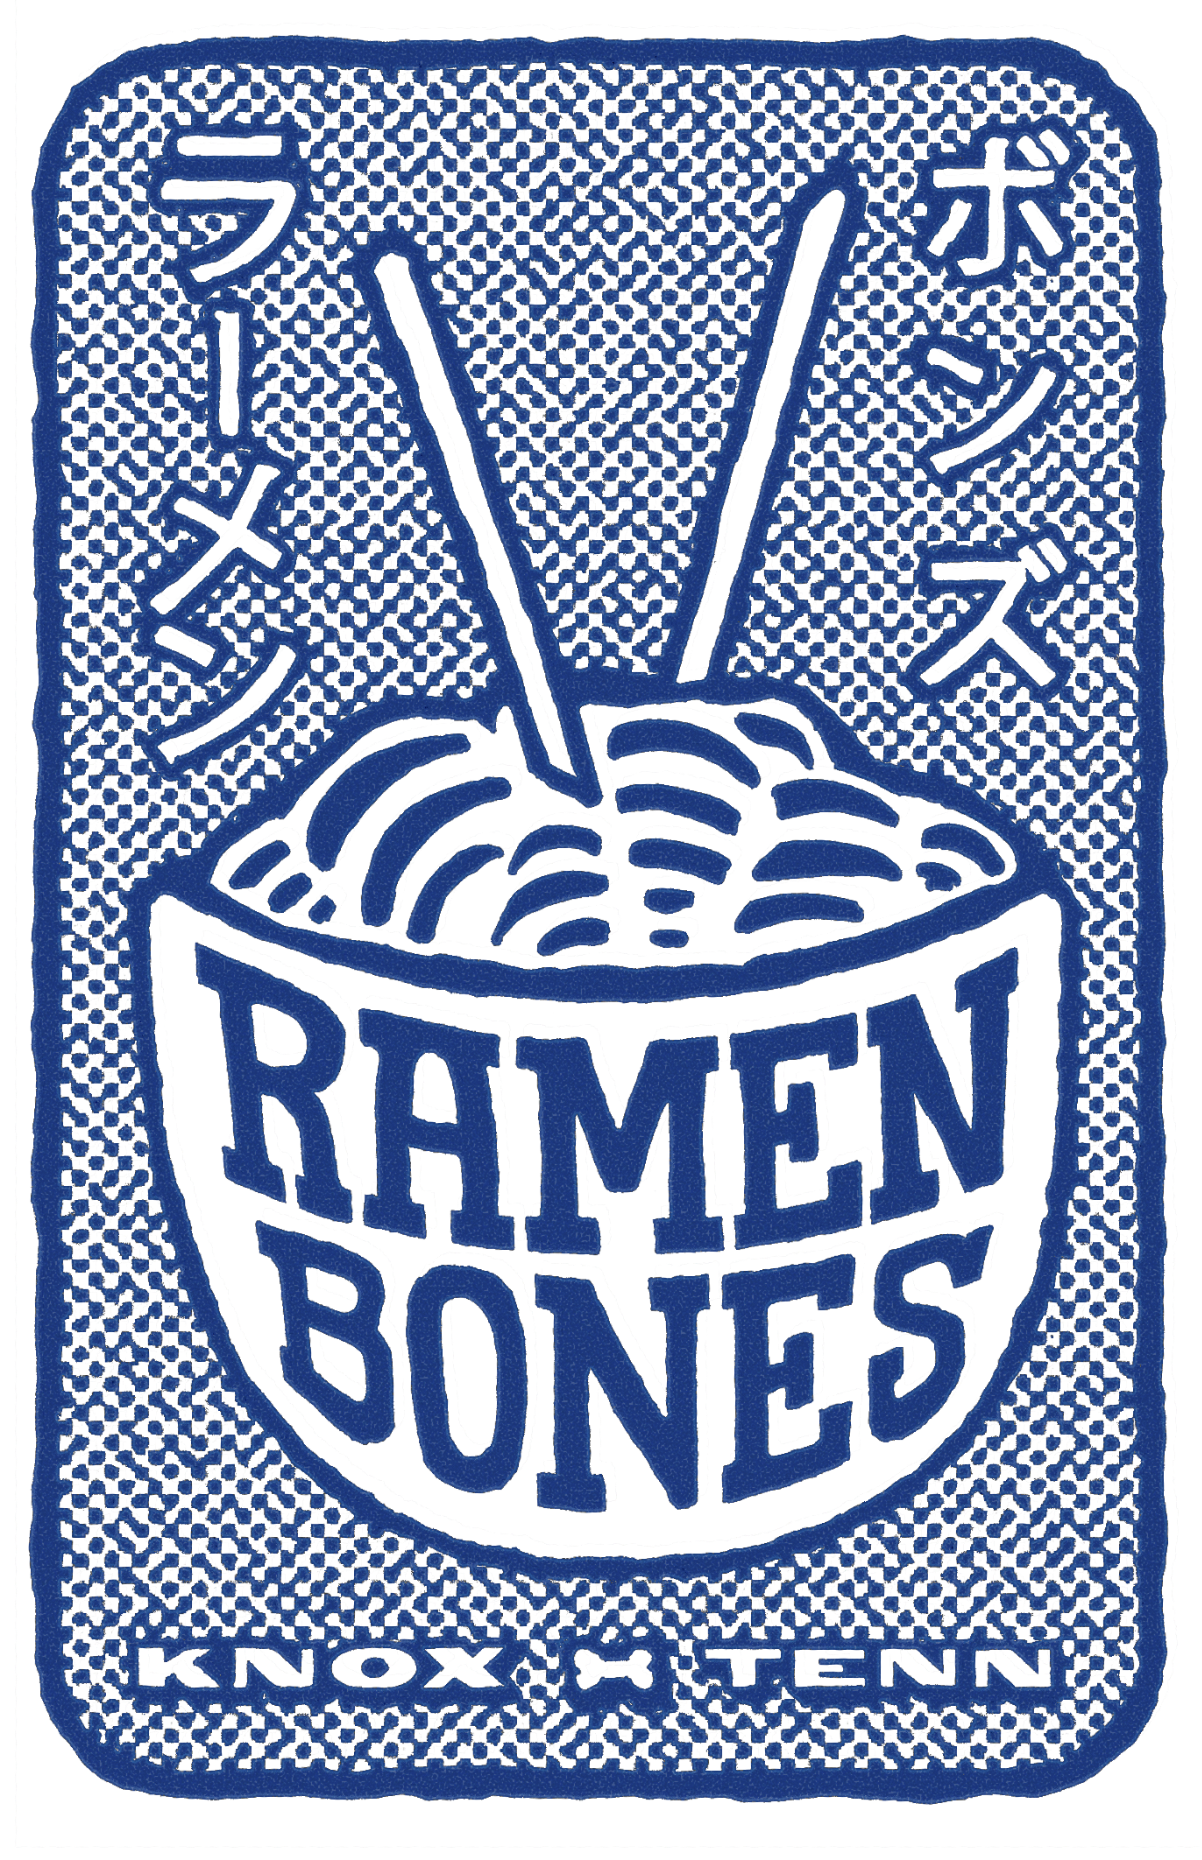 Ramen Bones Logo - Miki Nolin.png